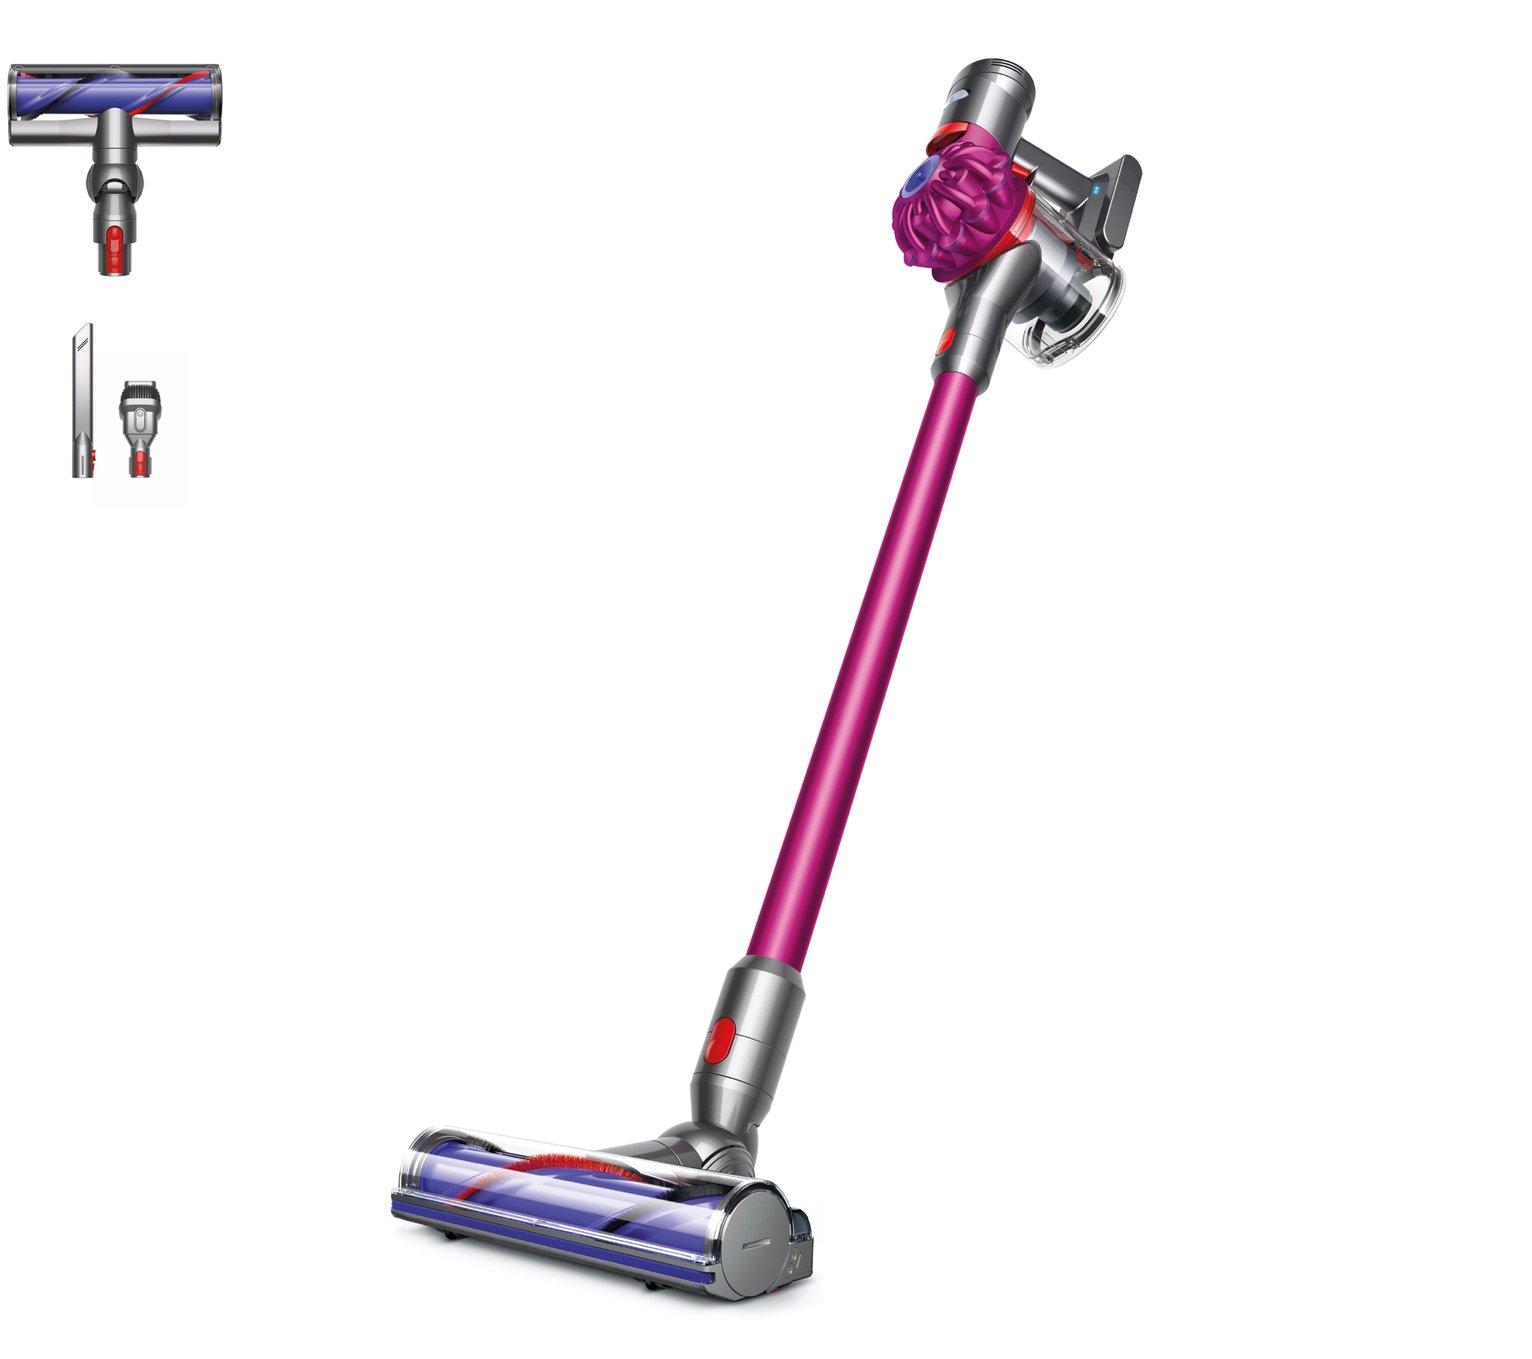 gtech air ram vs dyson v6 battle of the cordless vacuums 2017. Black Bedroom Furniture Sets. Home Design Ideas